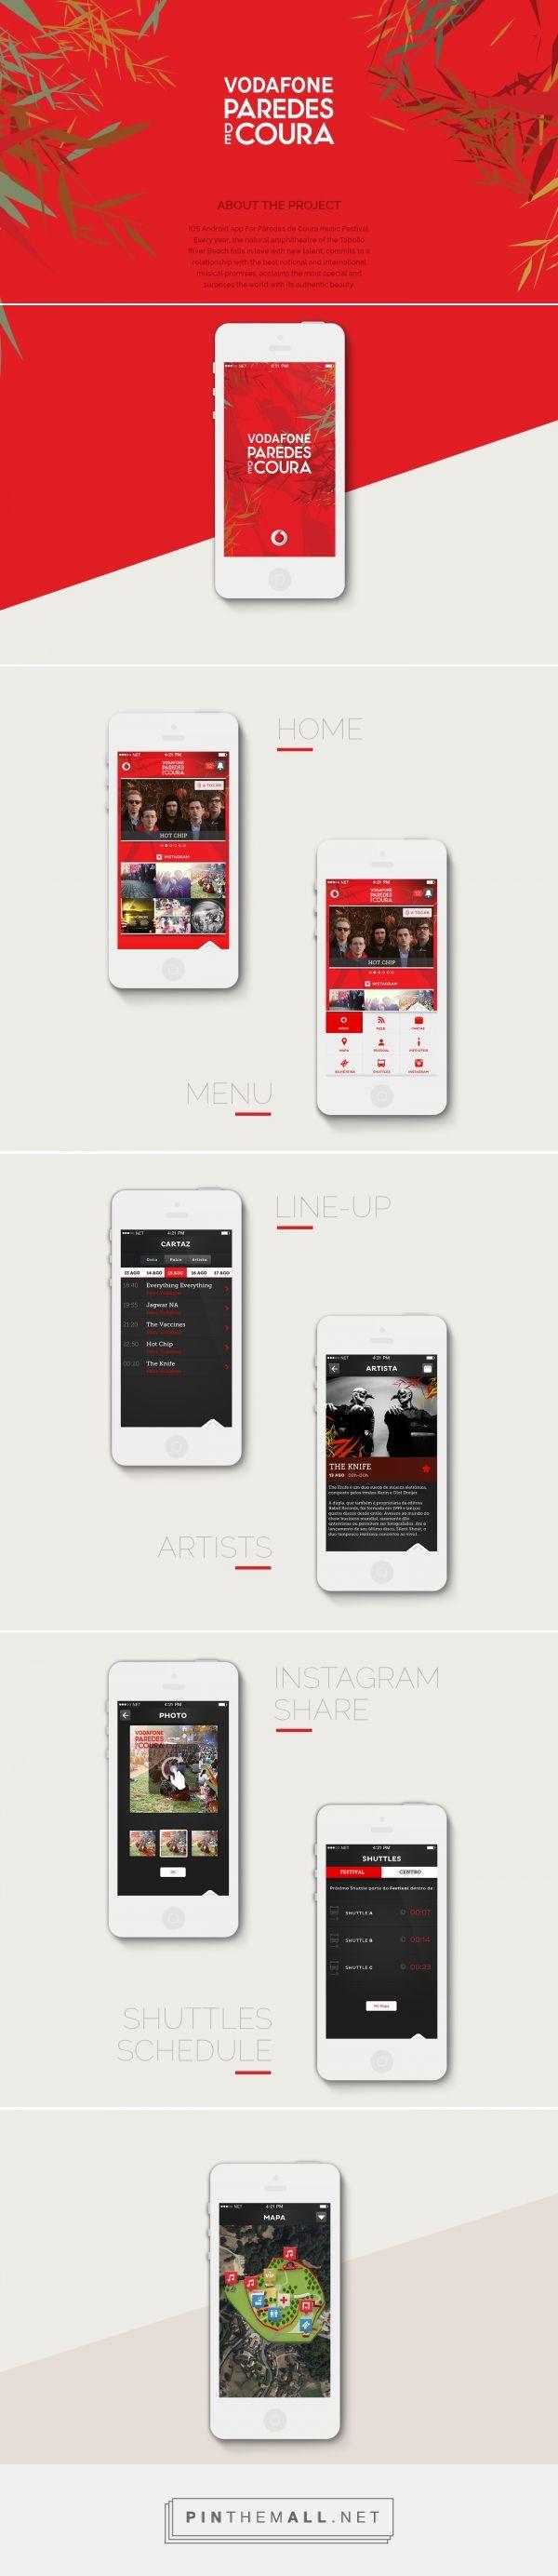 Ux solutions digital art director and motion designer based in noosa - Vodafone Paredes De Coura App